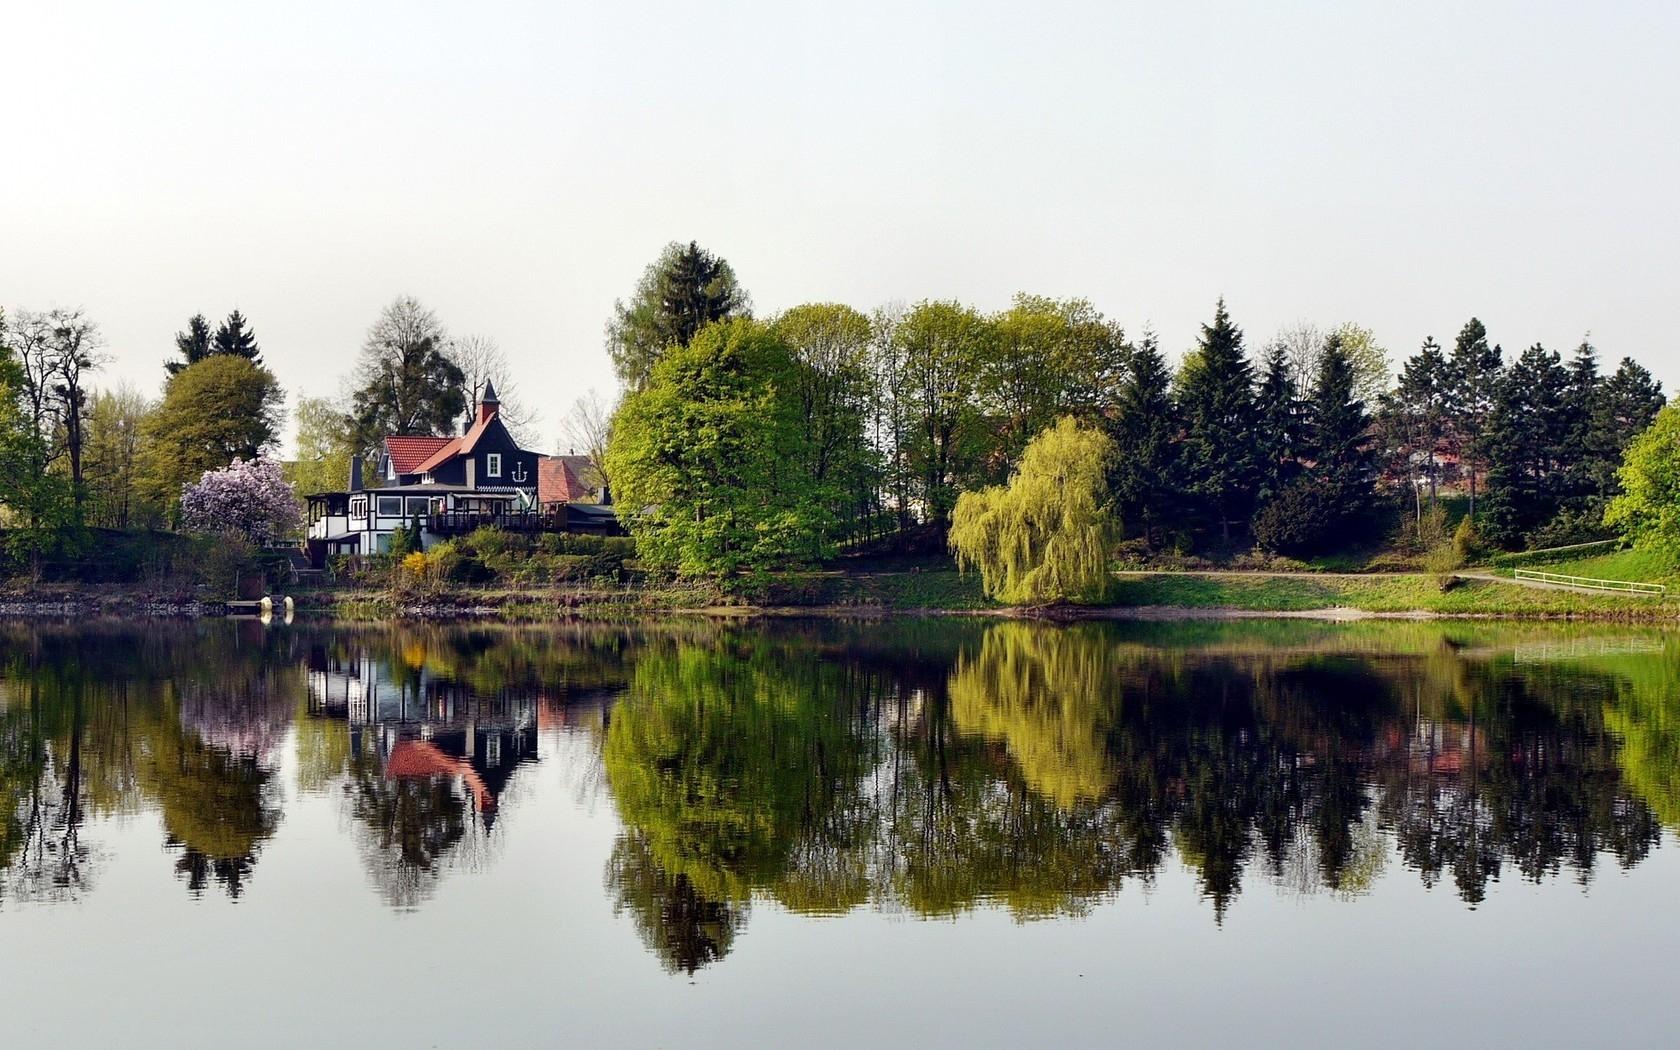 Зимняя фотосессия на озере праздника для